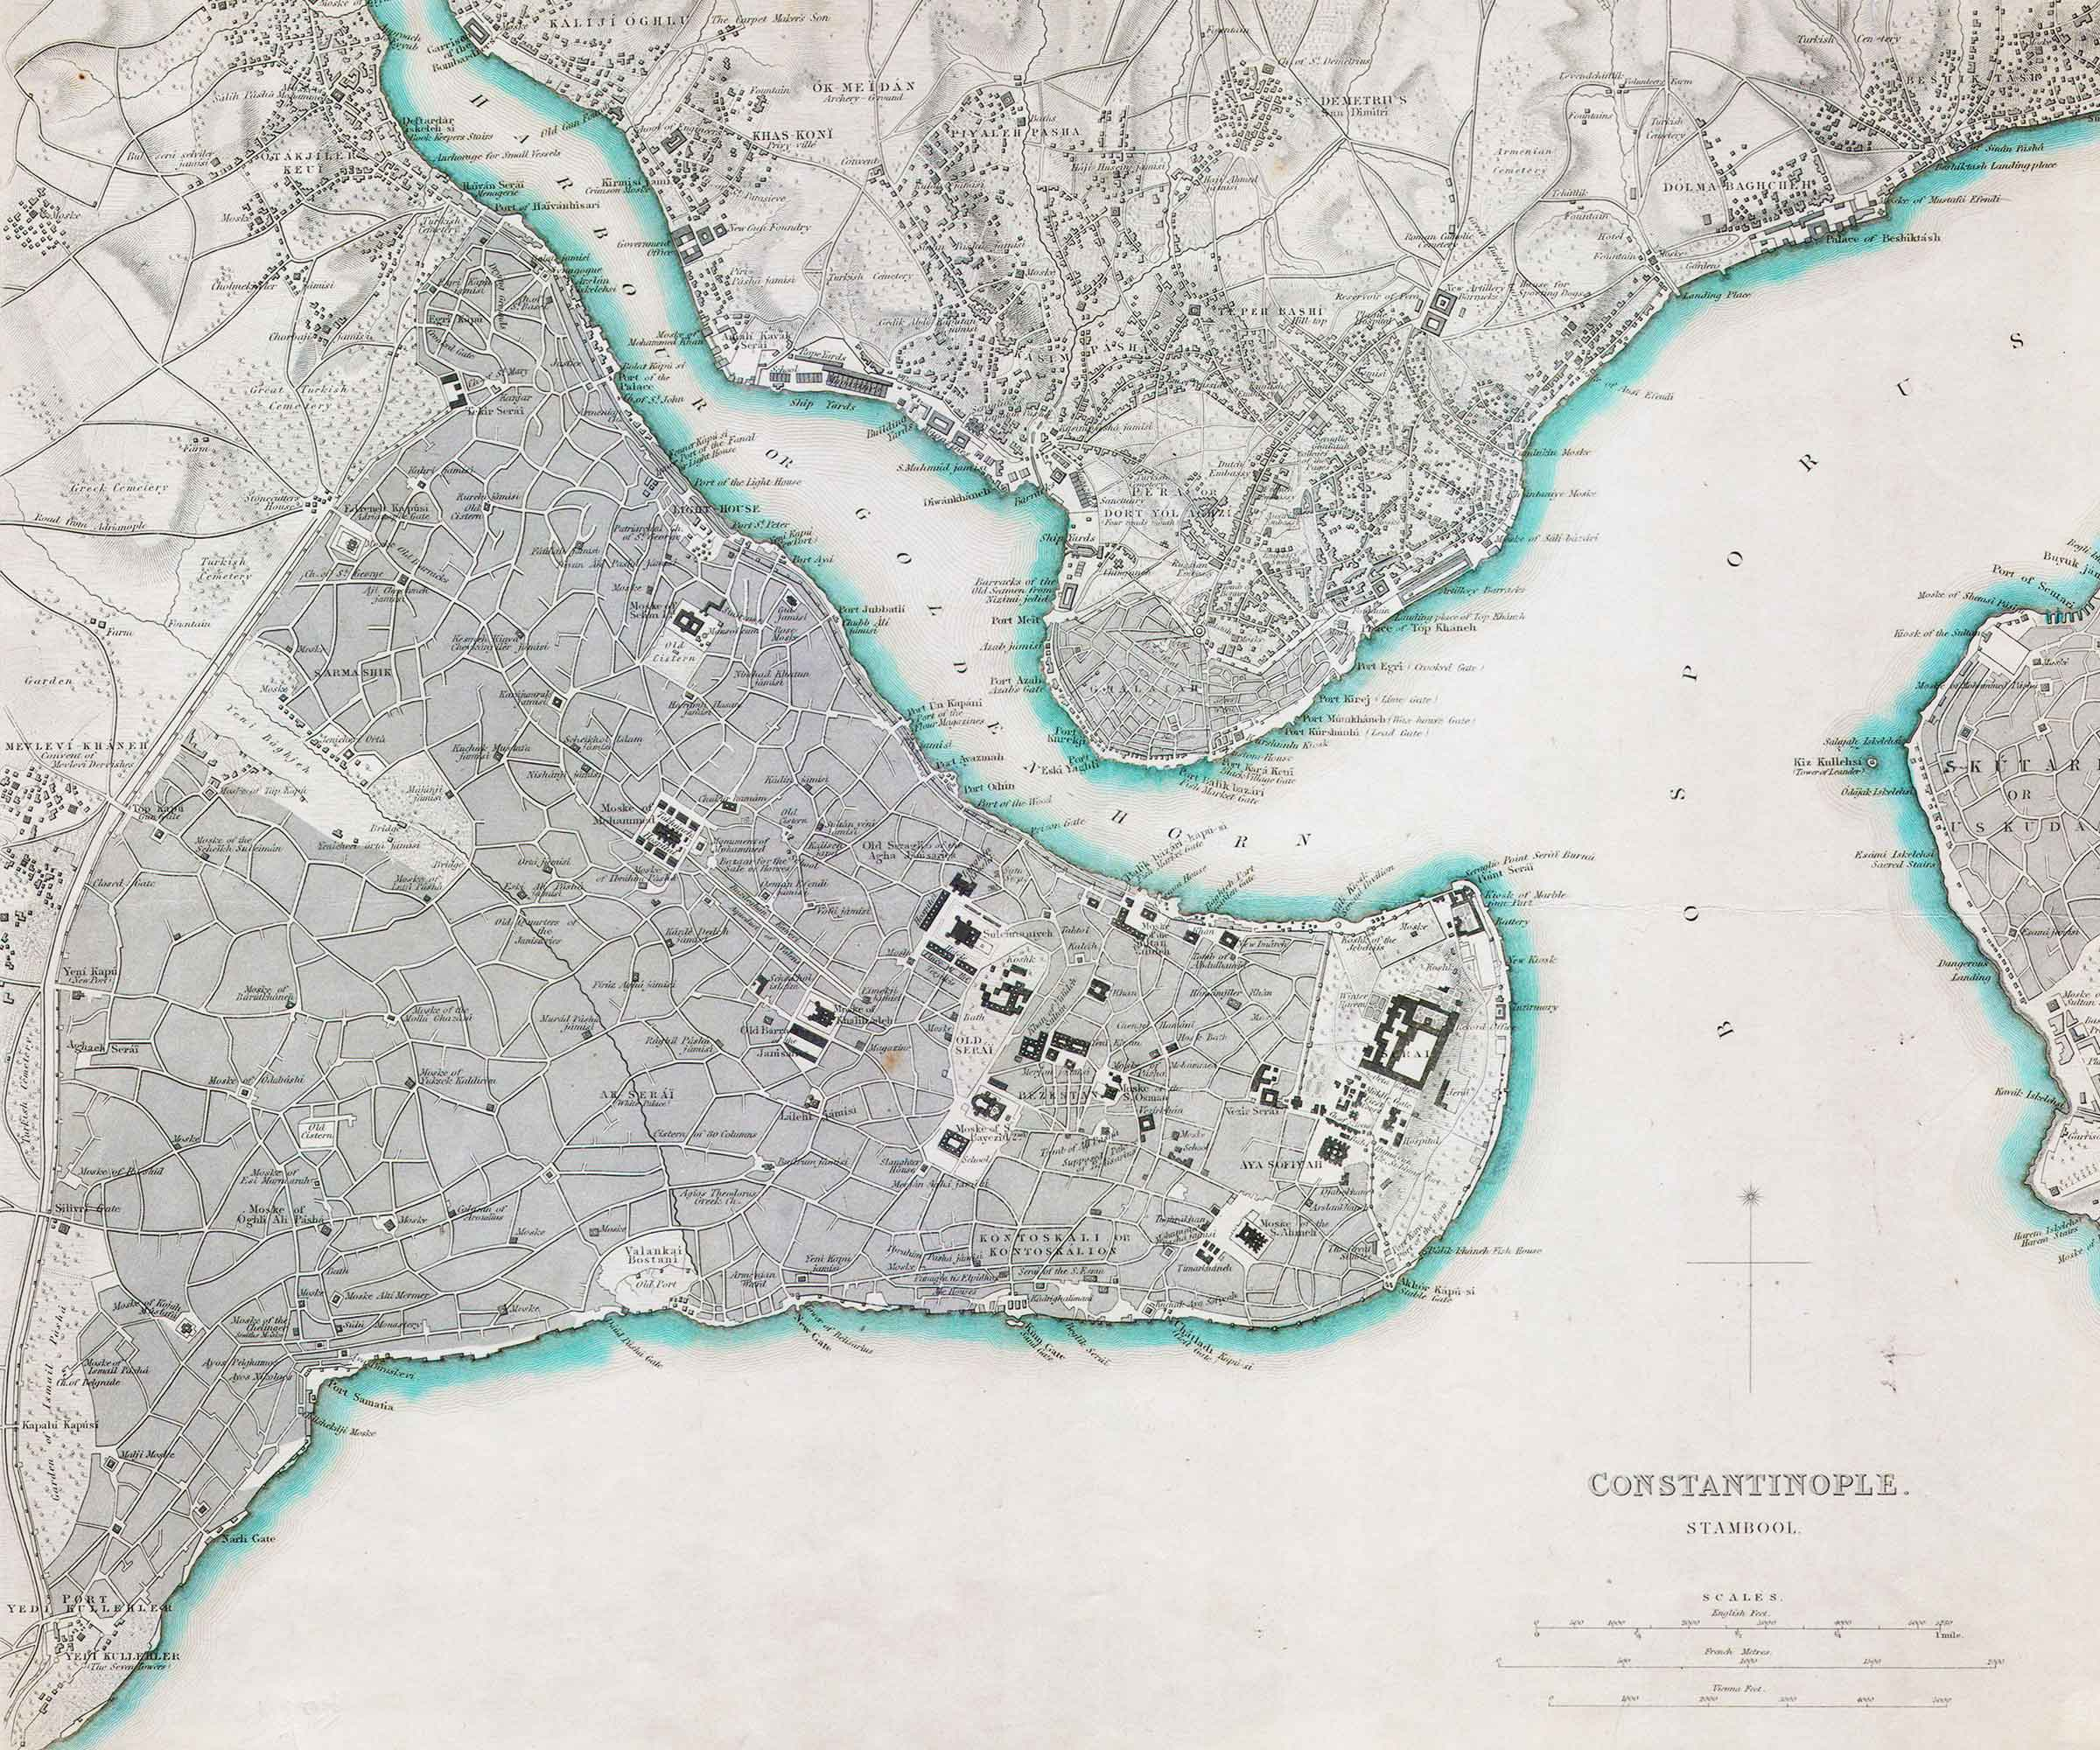 1840 Map of Constantinople – Istanbul, Turkey | SDUK steel plate engraving | Asst Professor Steven A Martin